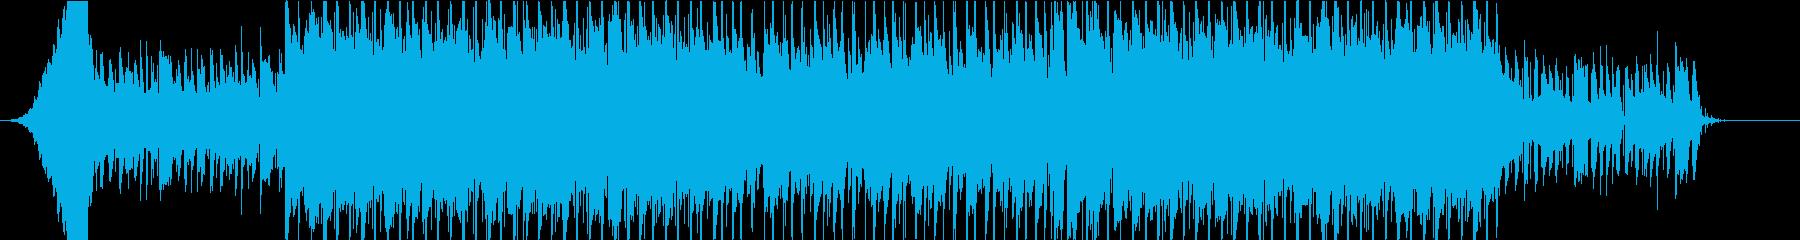 EDMっぽいシティポップの再生済みの波形